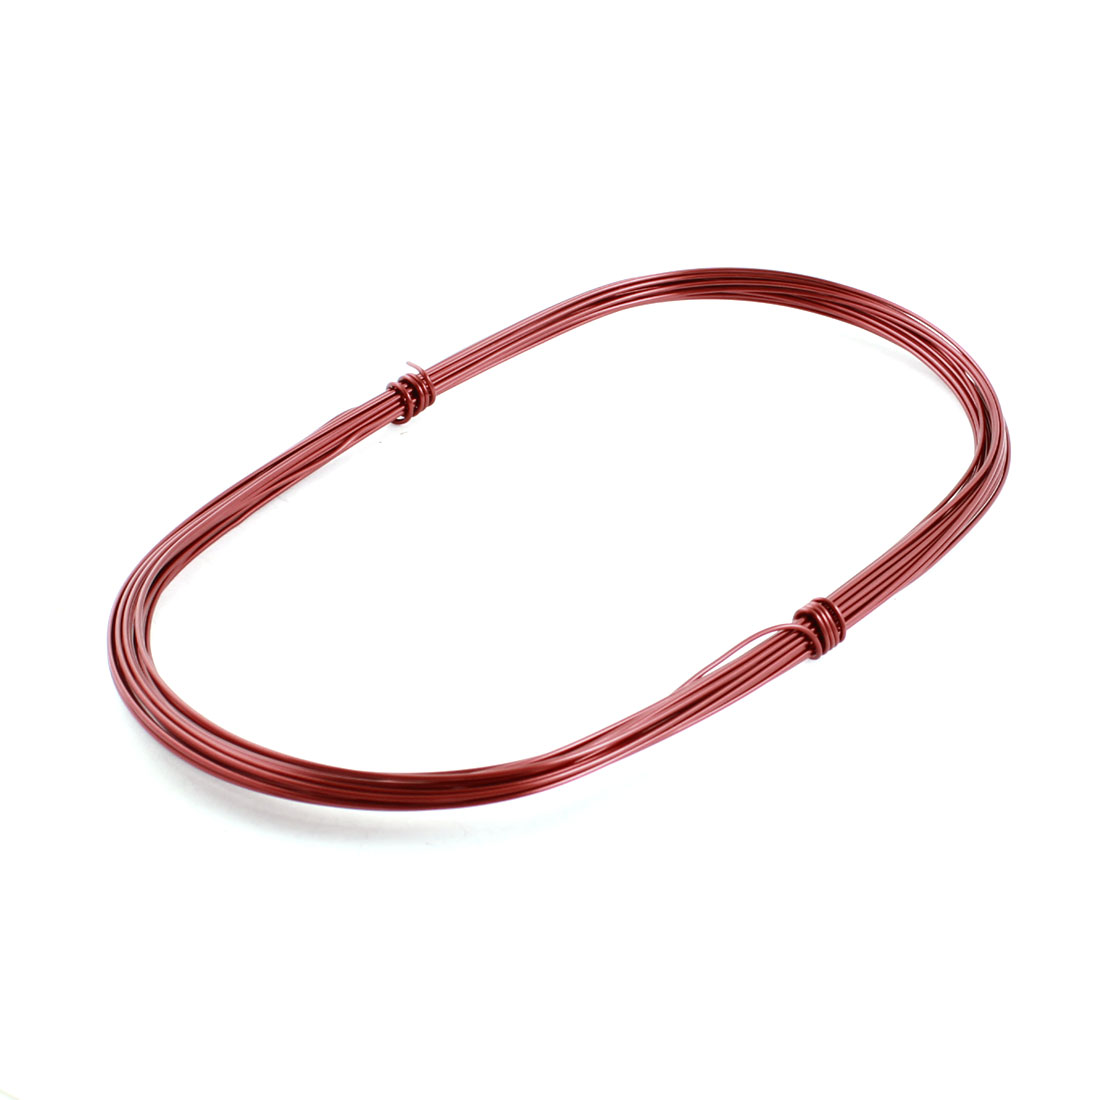 1.04mm Diameter Copper Soldering Solder PPA Enamelled Winding Wire Coil Line 10m 33ft Length